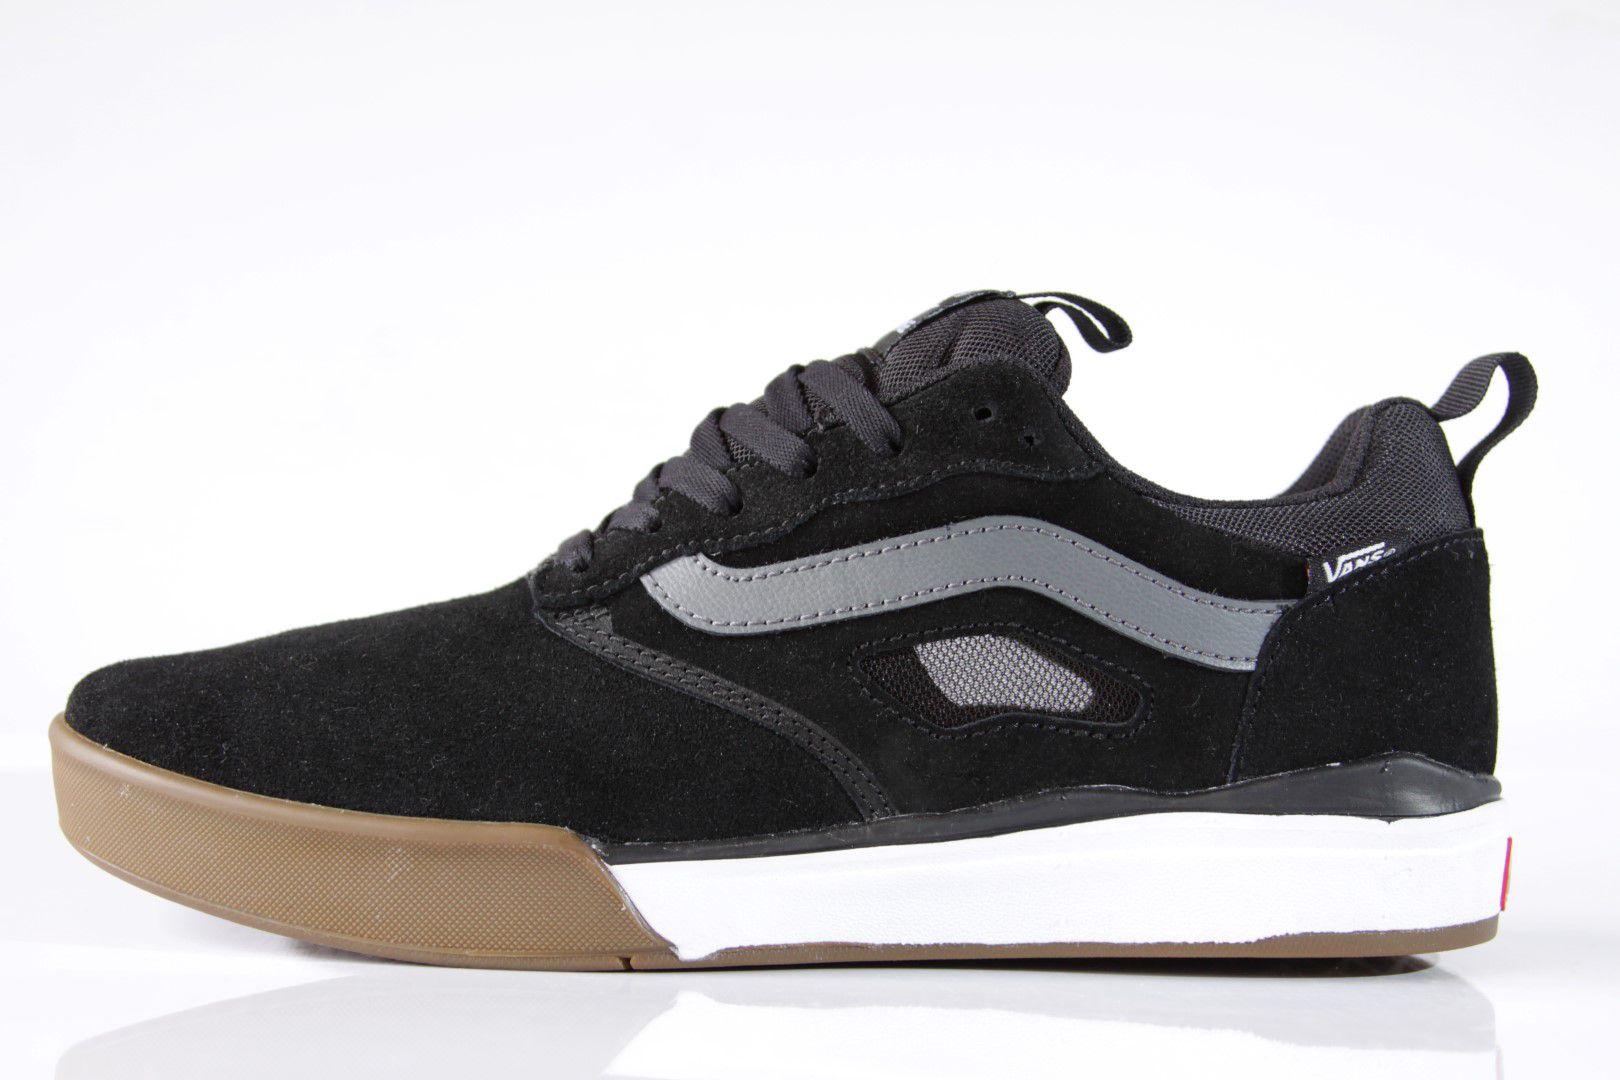 Tênis Vans - MN Ultrarange Pro Black/Gum/White  - No Comply Skate Shop